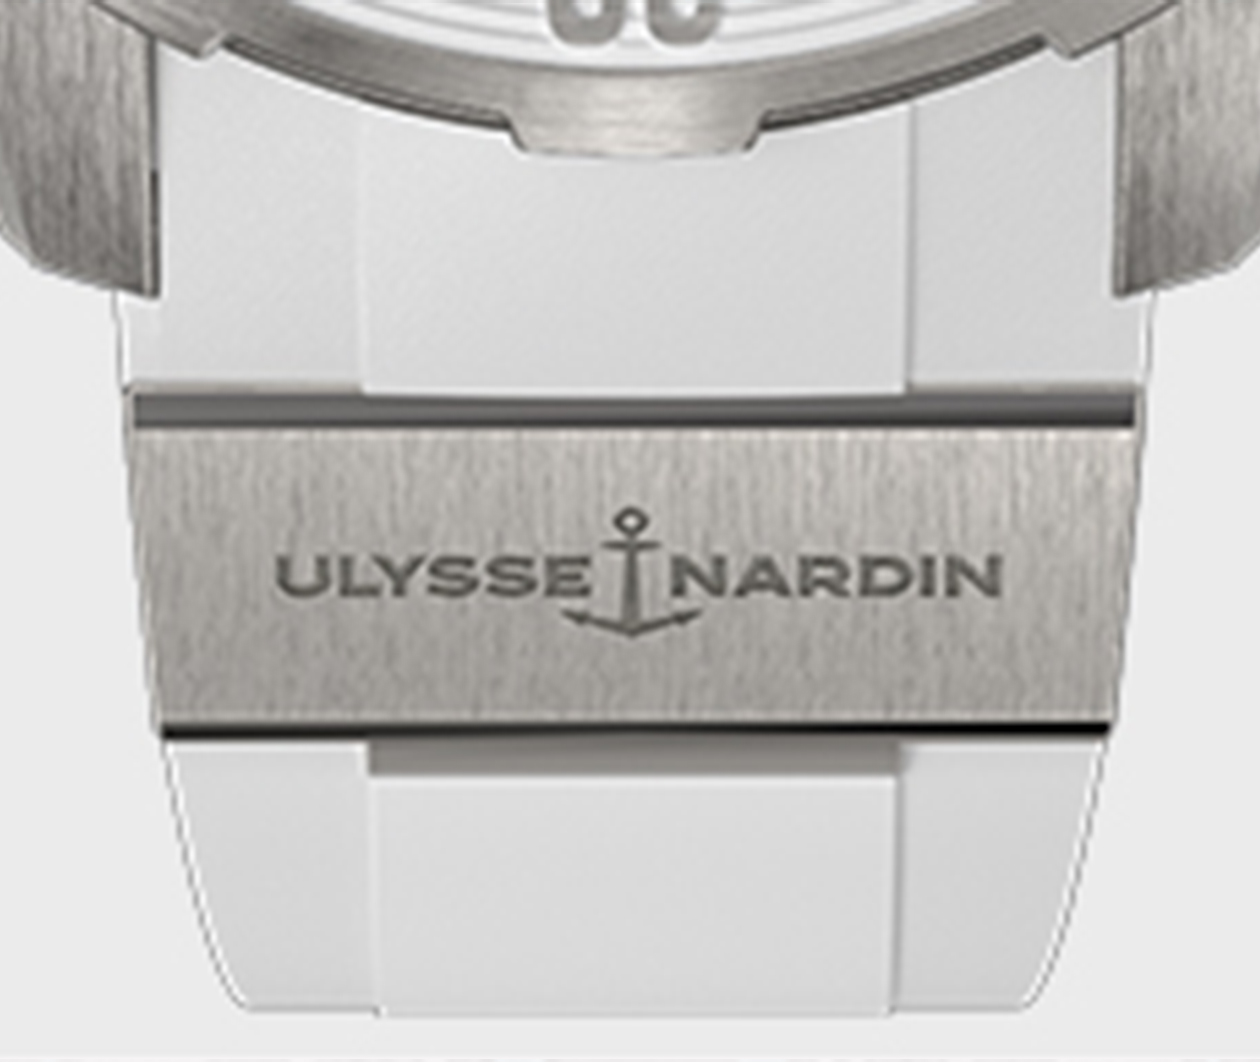 UlysseNardin Diver X42mm 1183170LE390ANT Carousel 4 FINAL